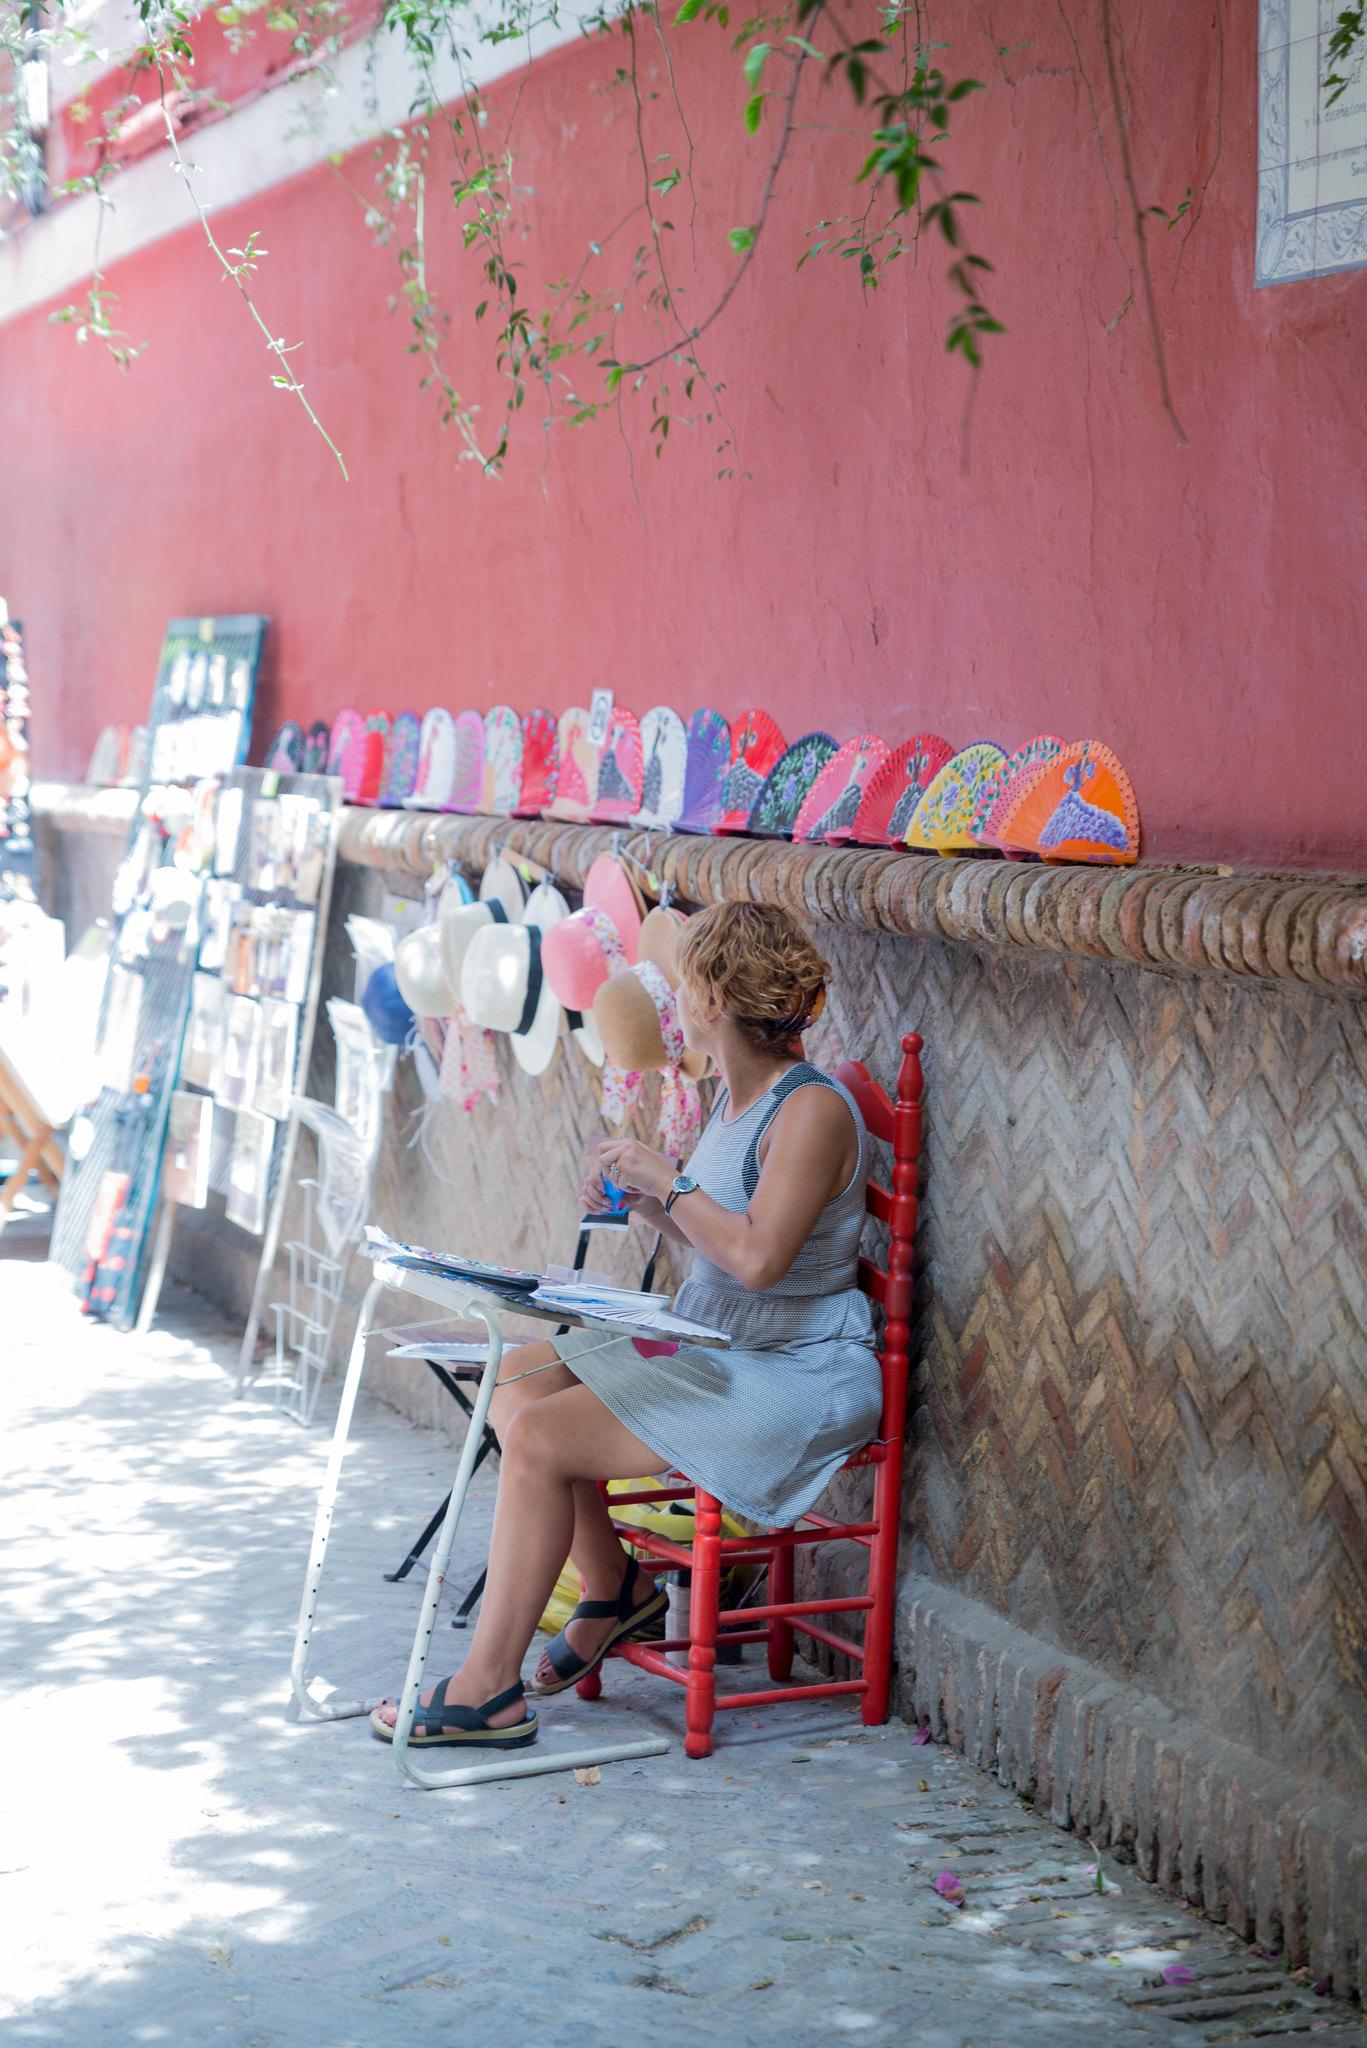 back alley artisan working in Seville spain